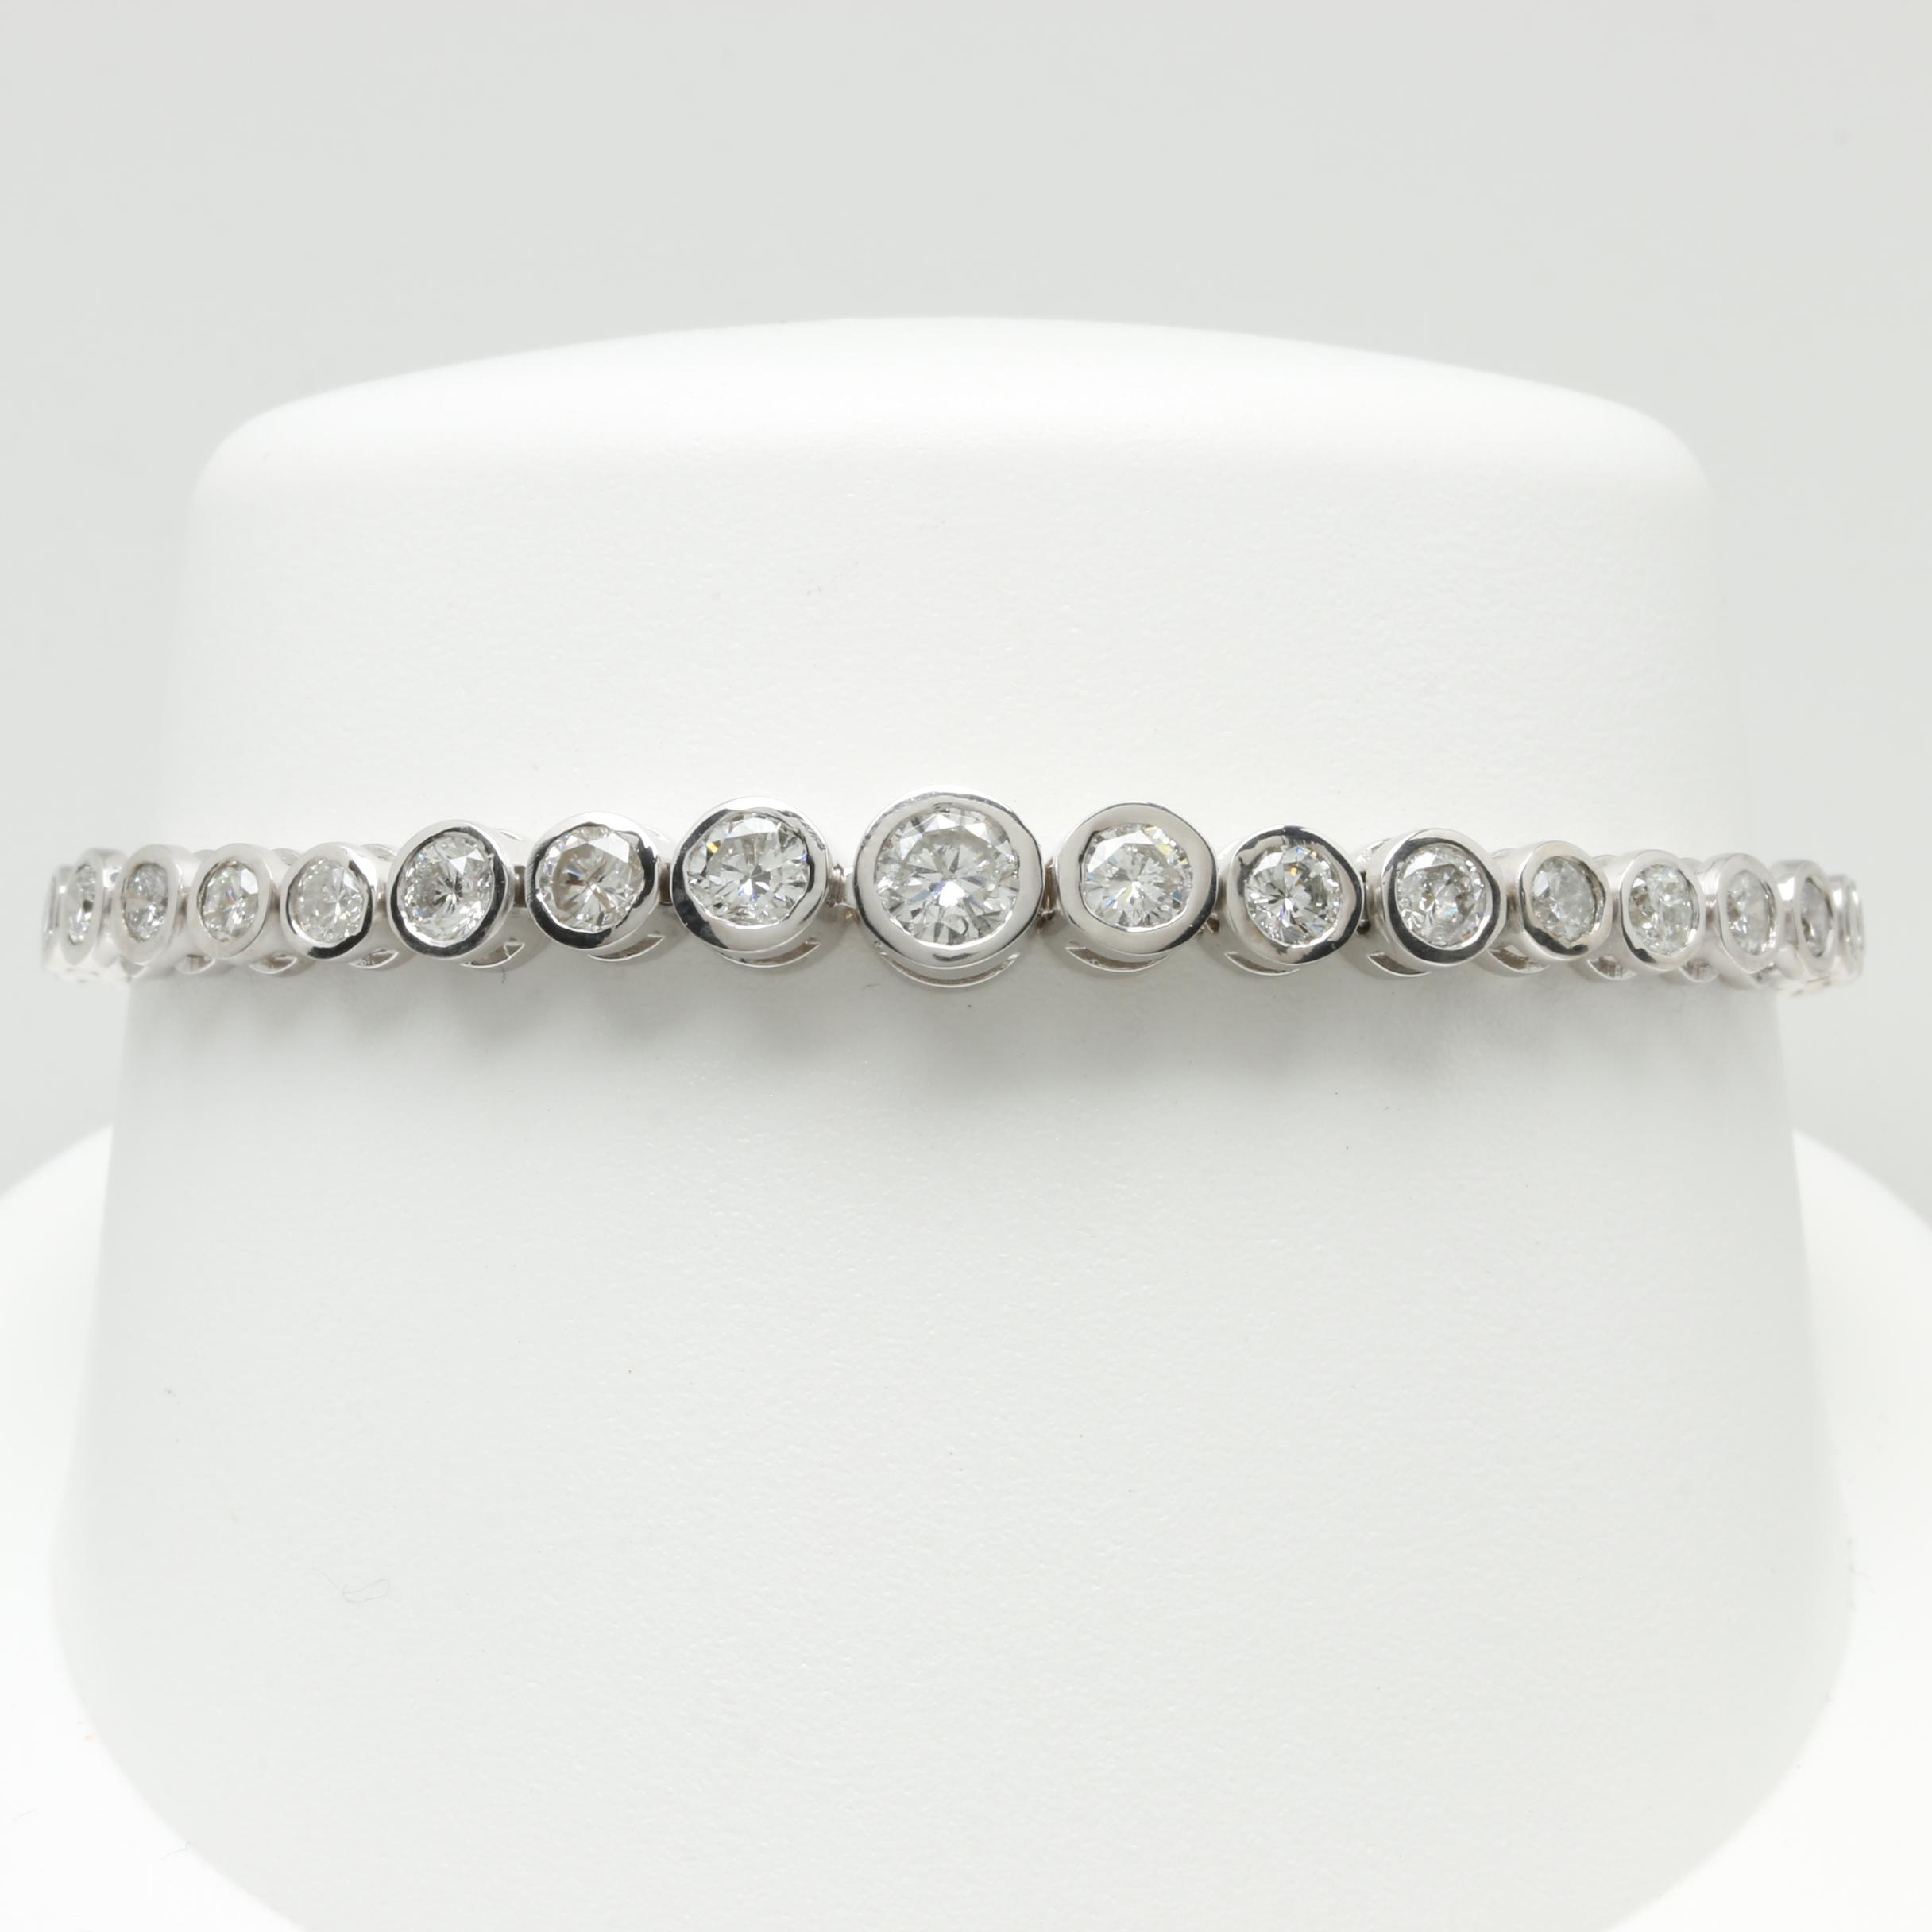 14K White Gold 4.75 CTW Diamond Tennis Bracelet